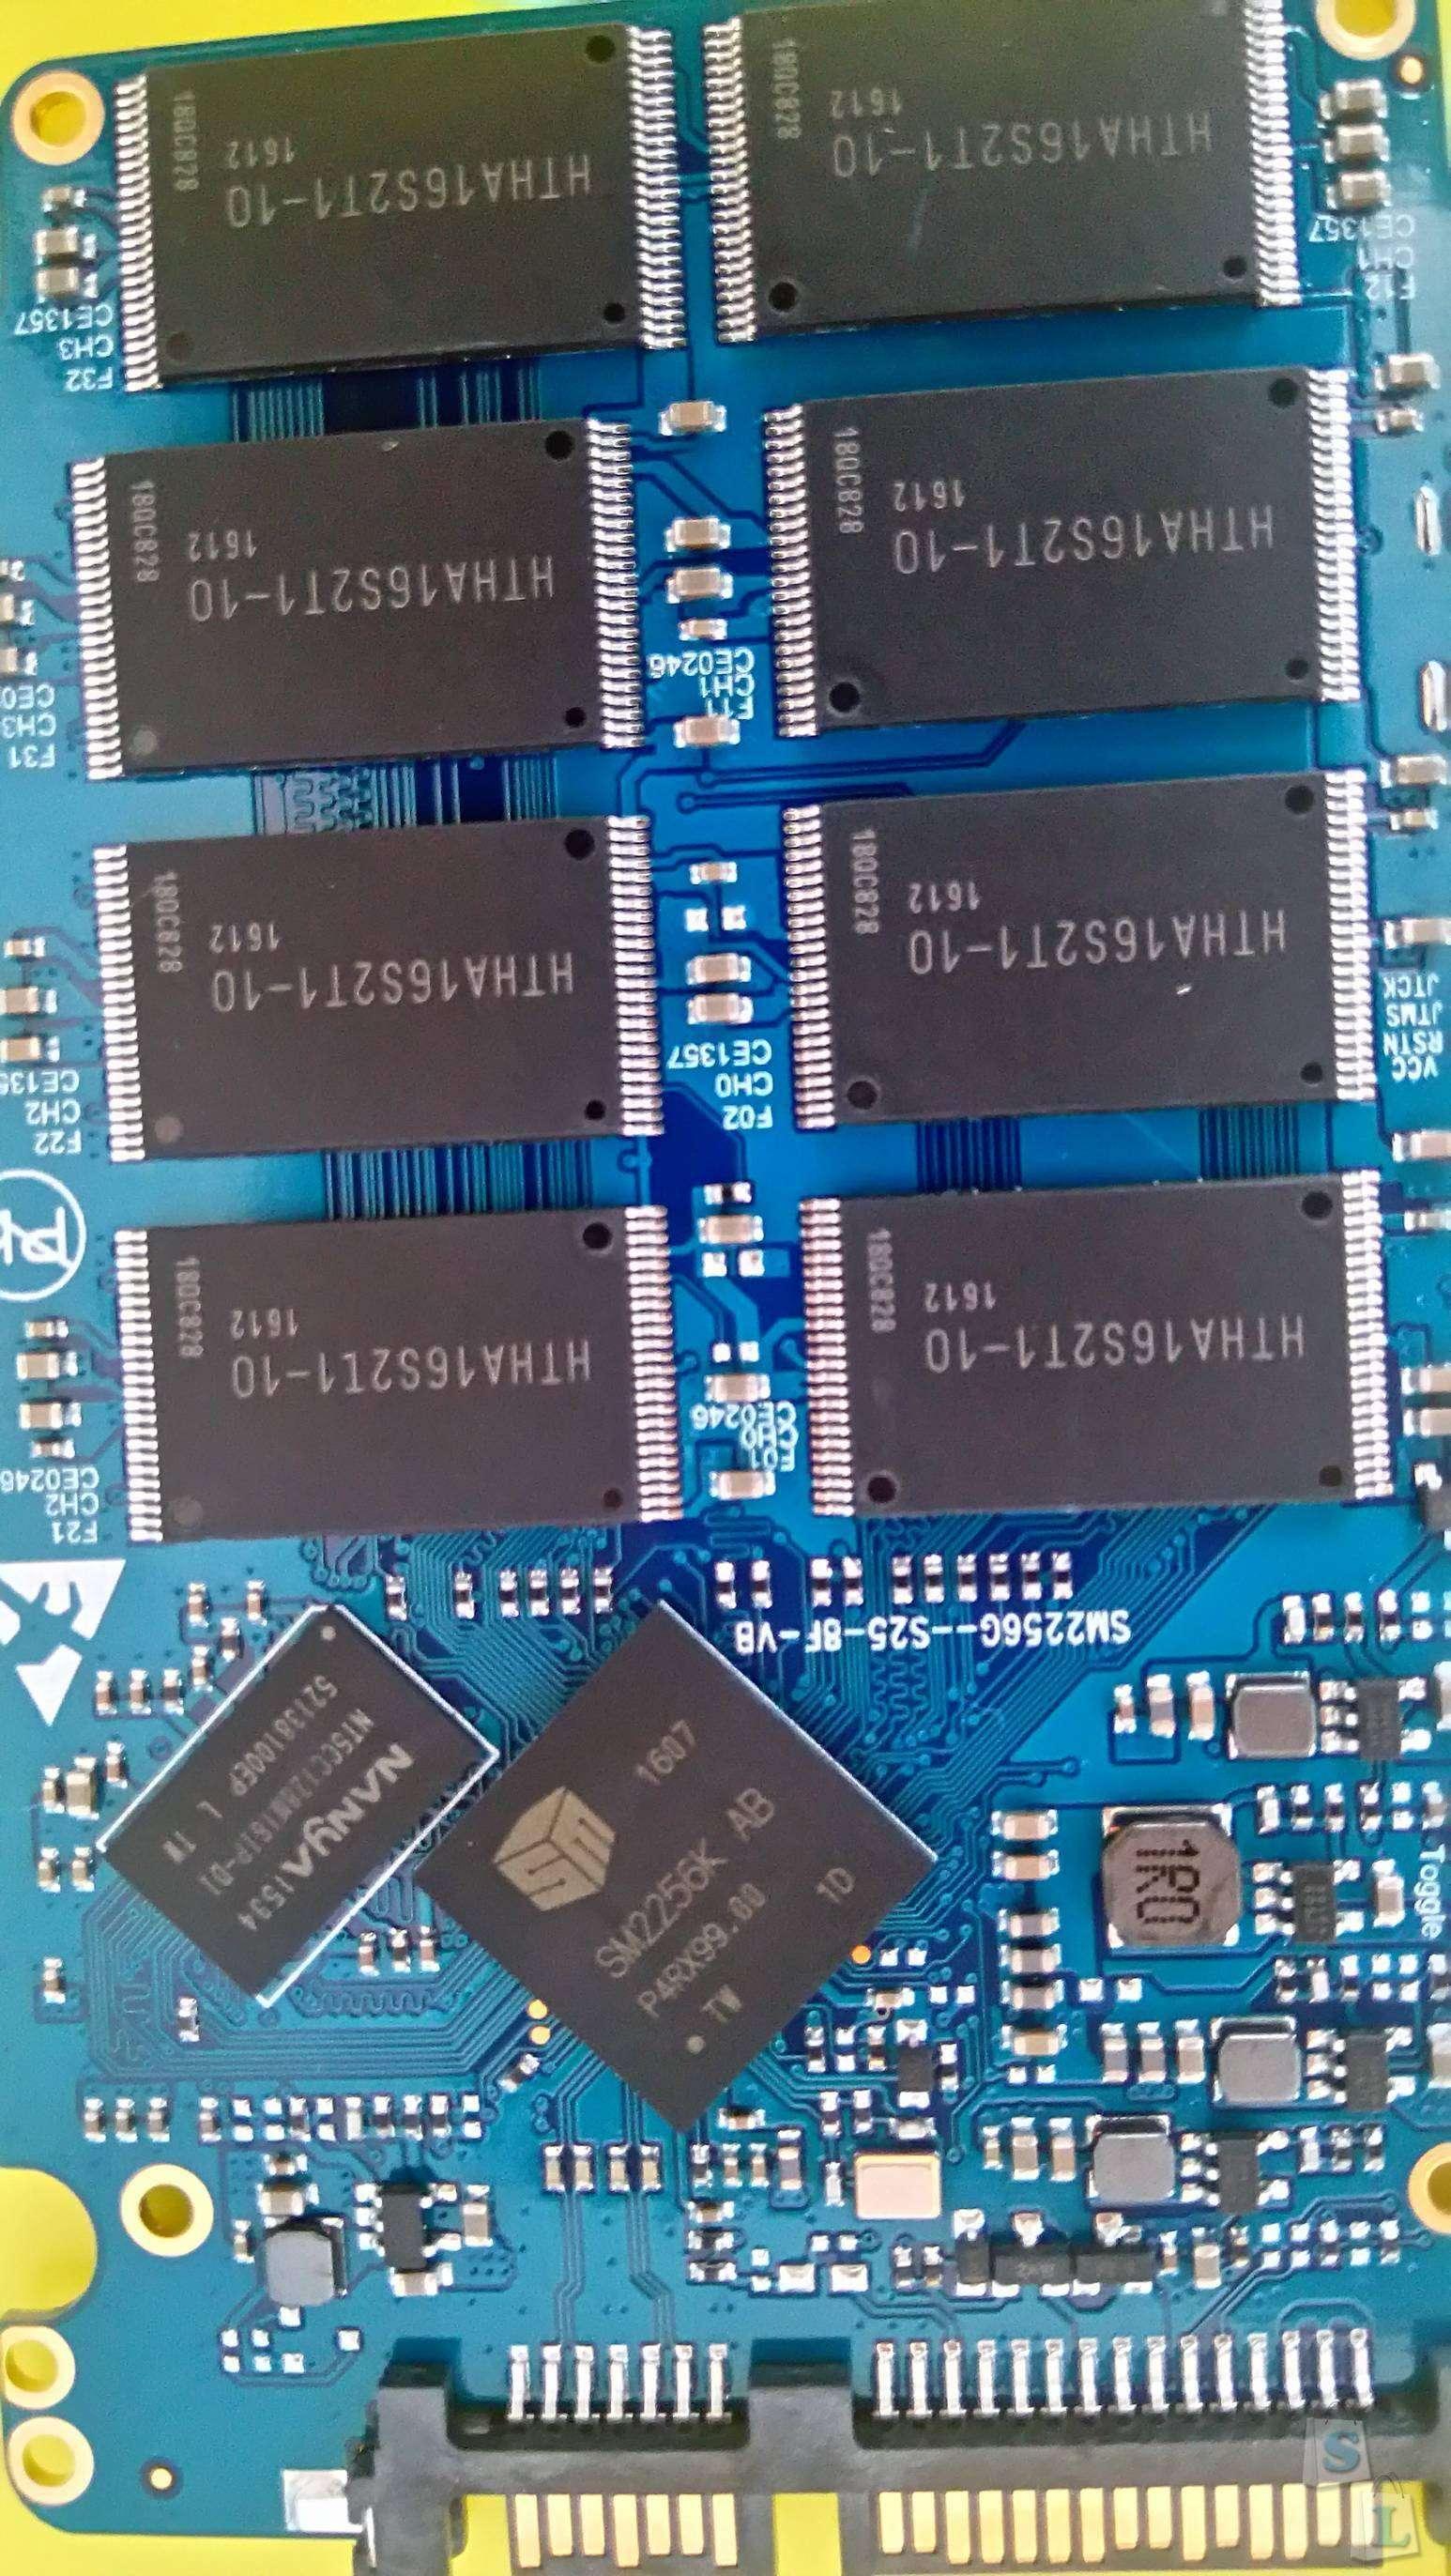 GearBest: KingDian S280-240GB SSD 2.5'', оснащенный интерфейсом SATA3